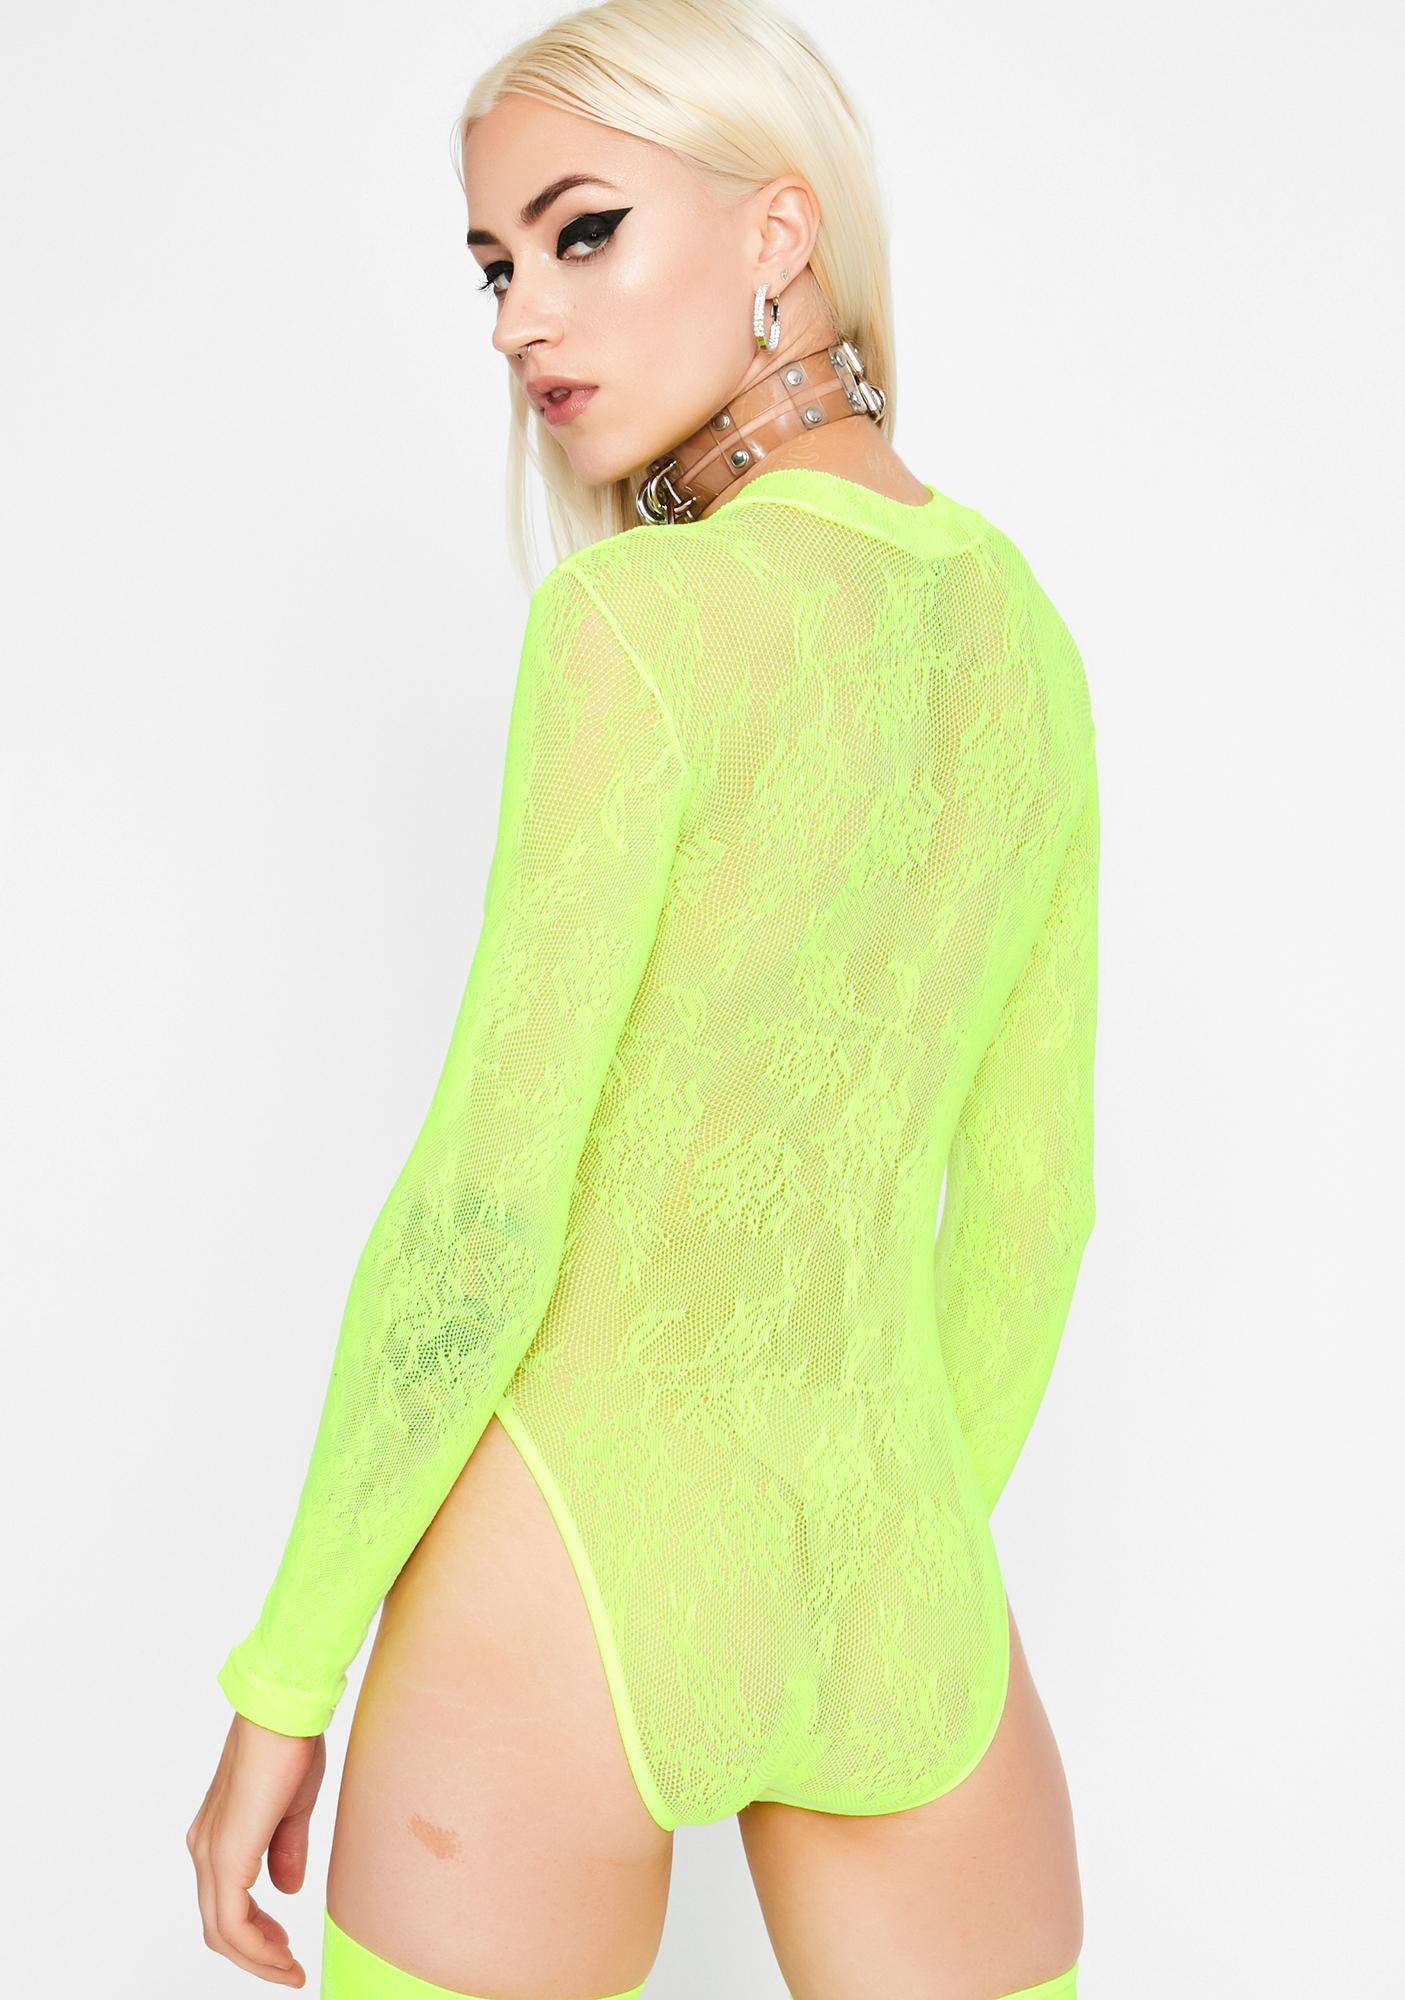 Electric Love Lace Bodysuit